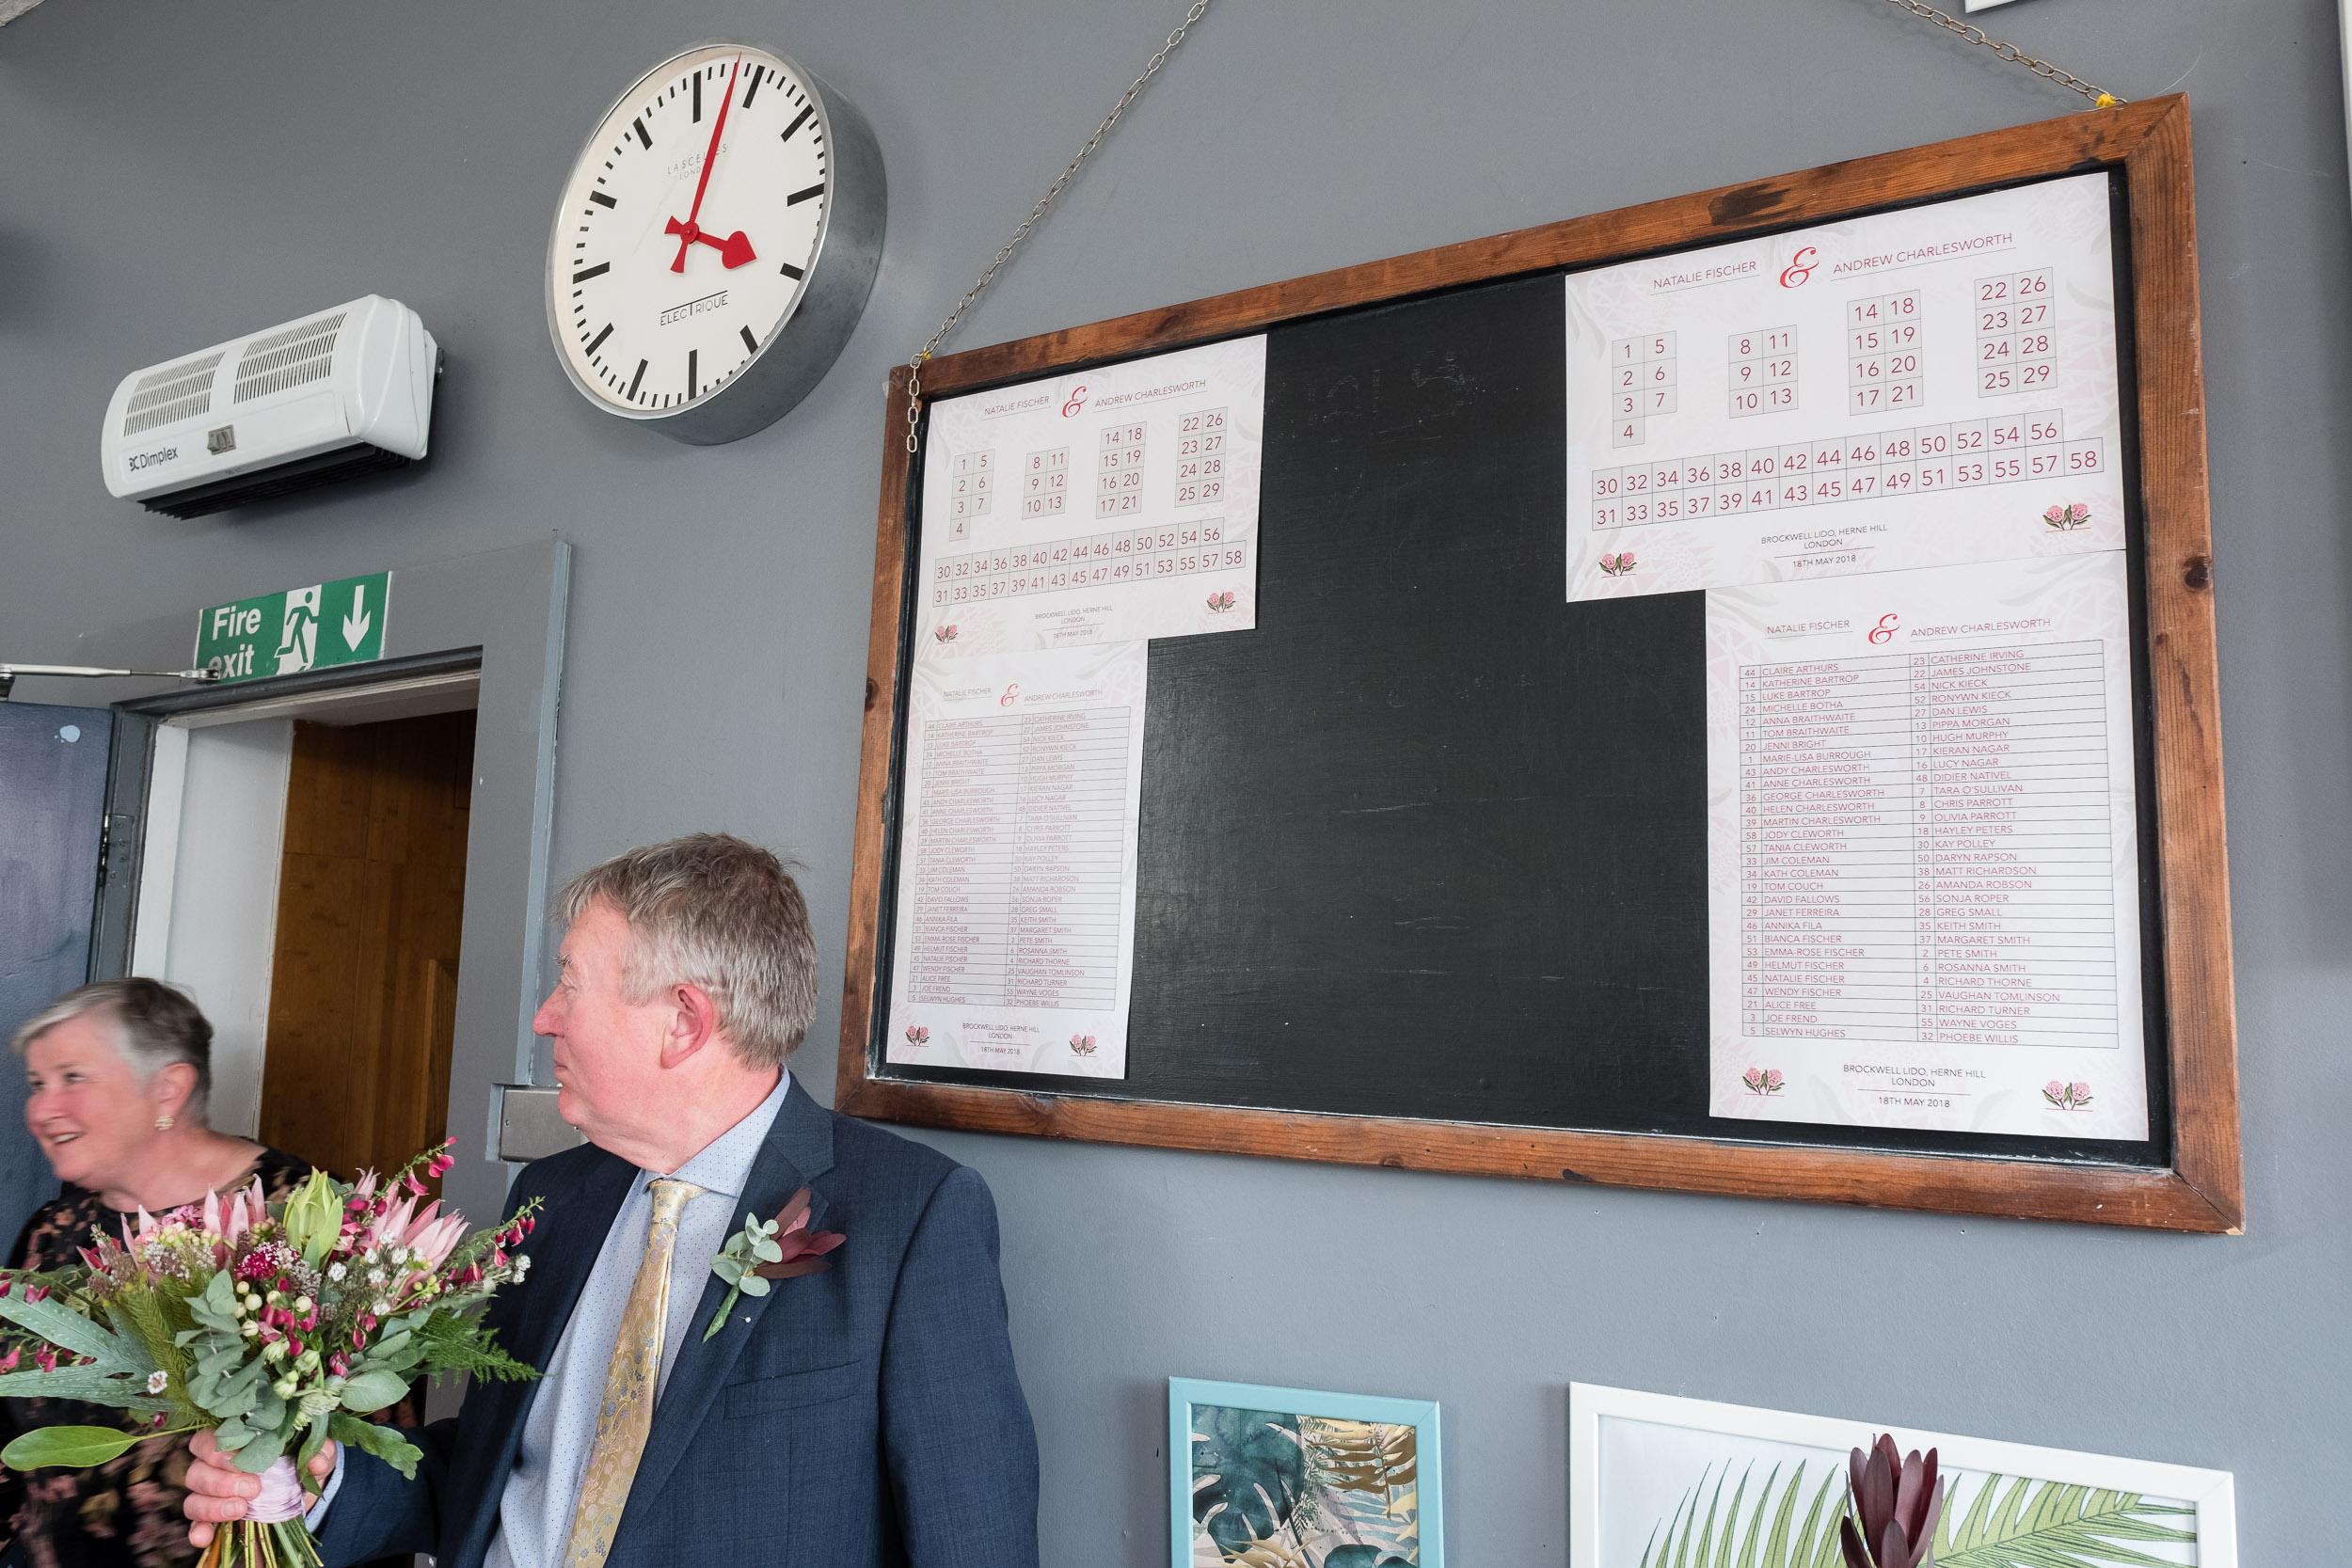 brockwell-lido-brixton-herne-hill-wedding-246.jpg